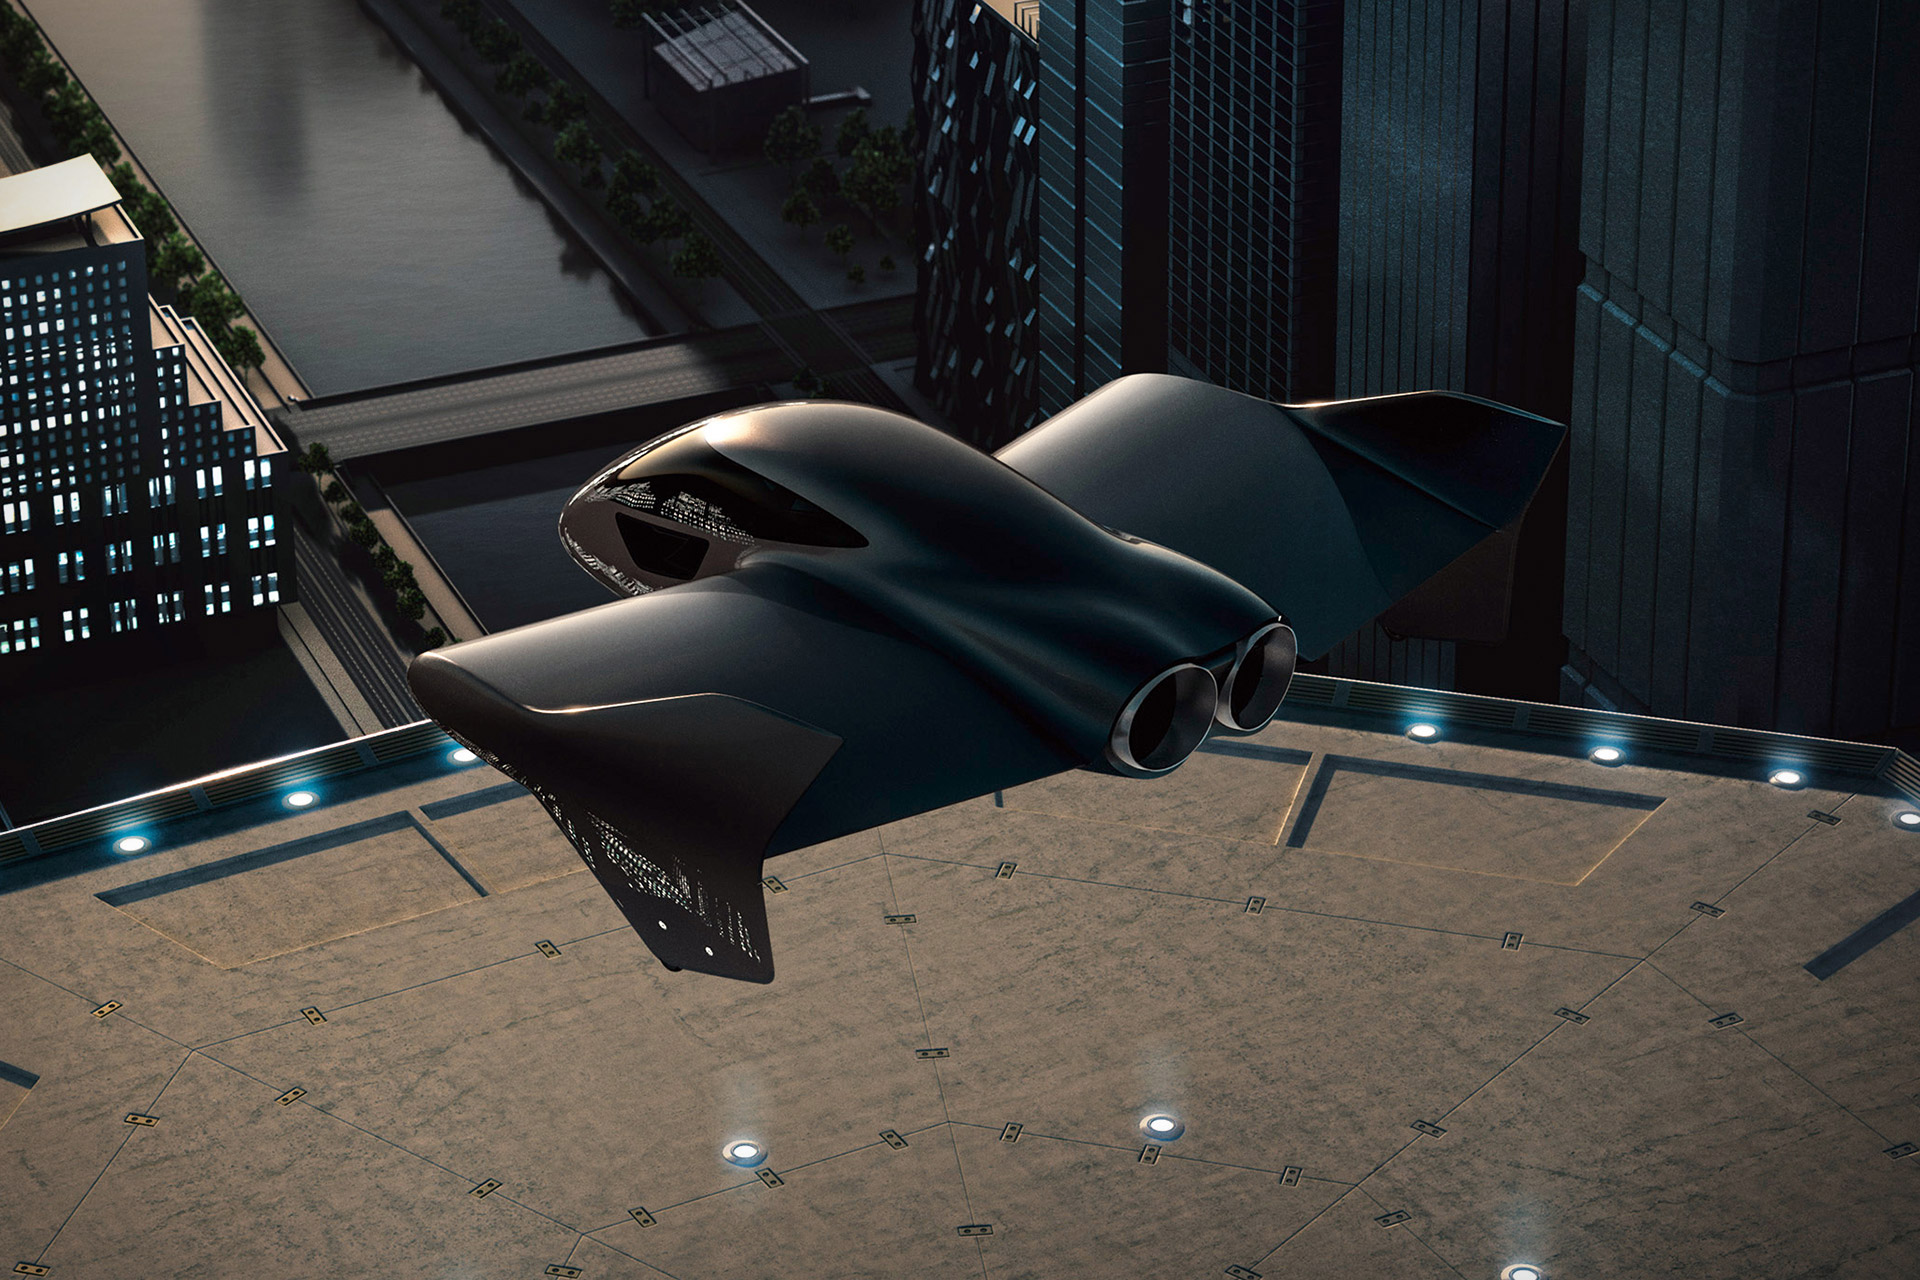 Porsche x Boeing Air Mobility Vehicle